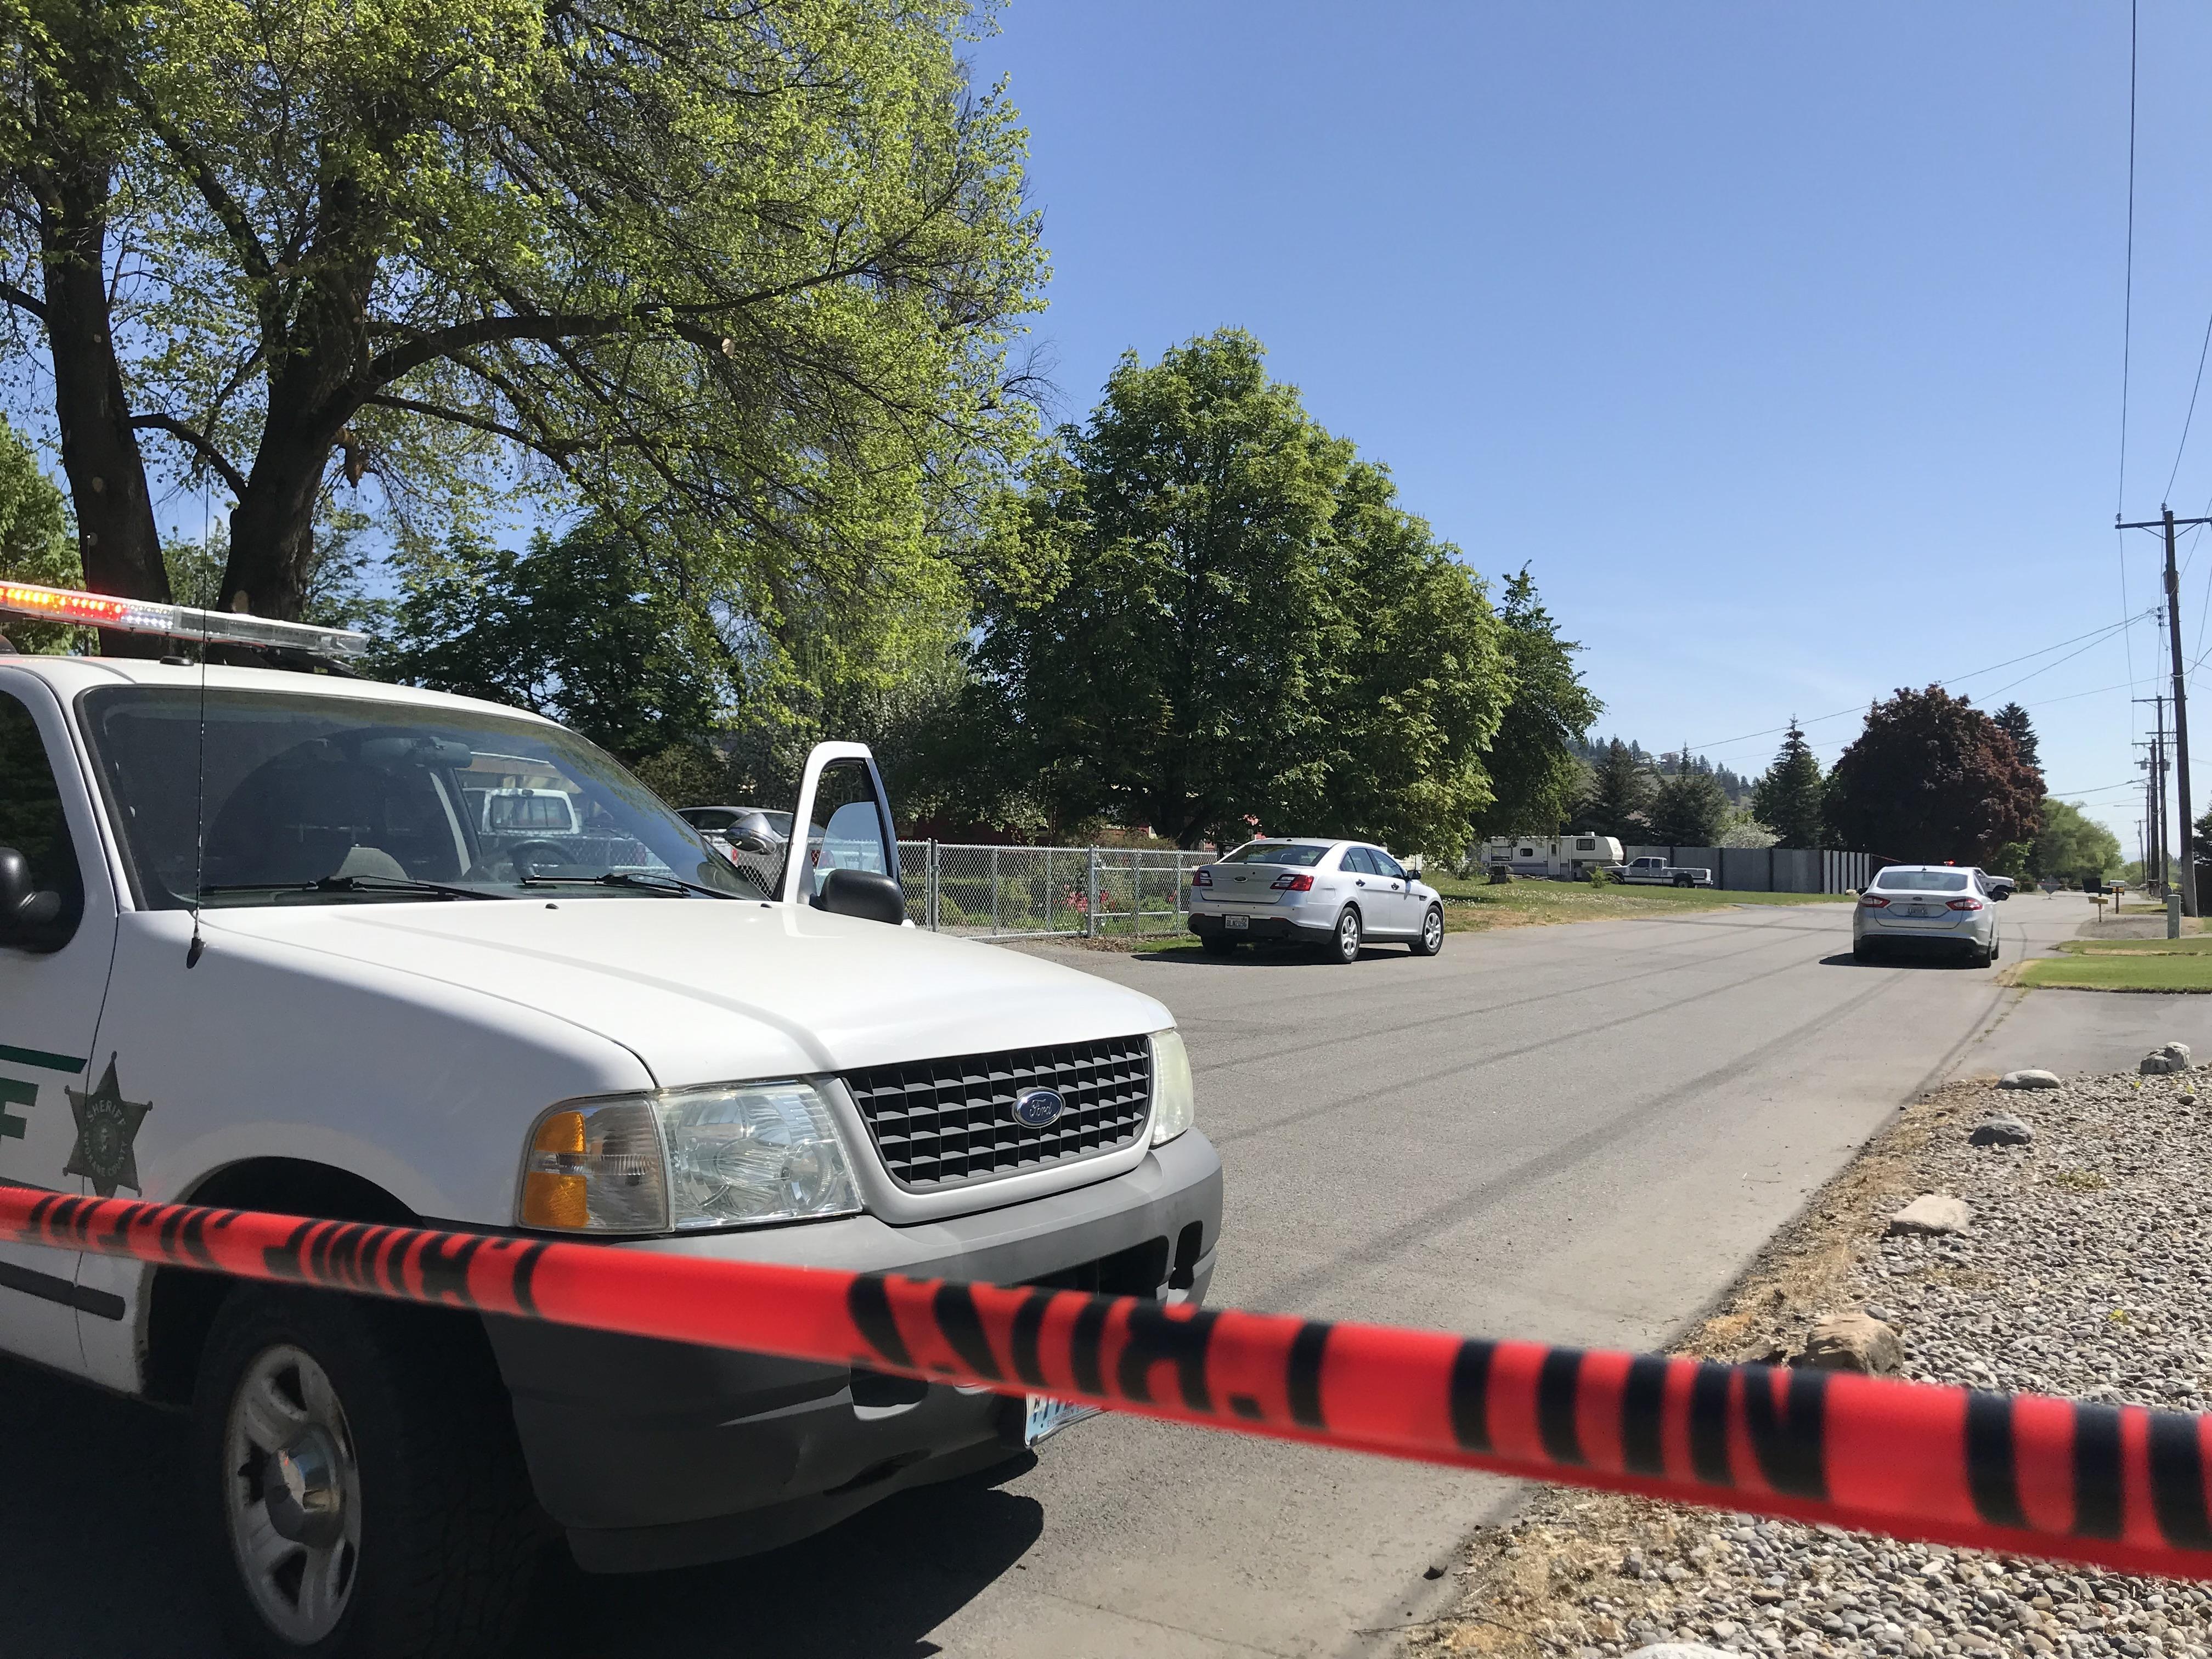 Man in custody after stabbing roommate 'multiple times